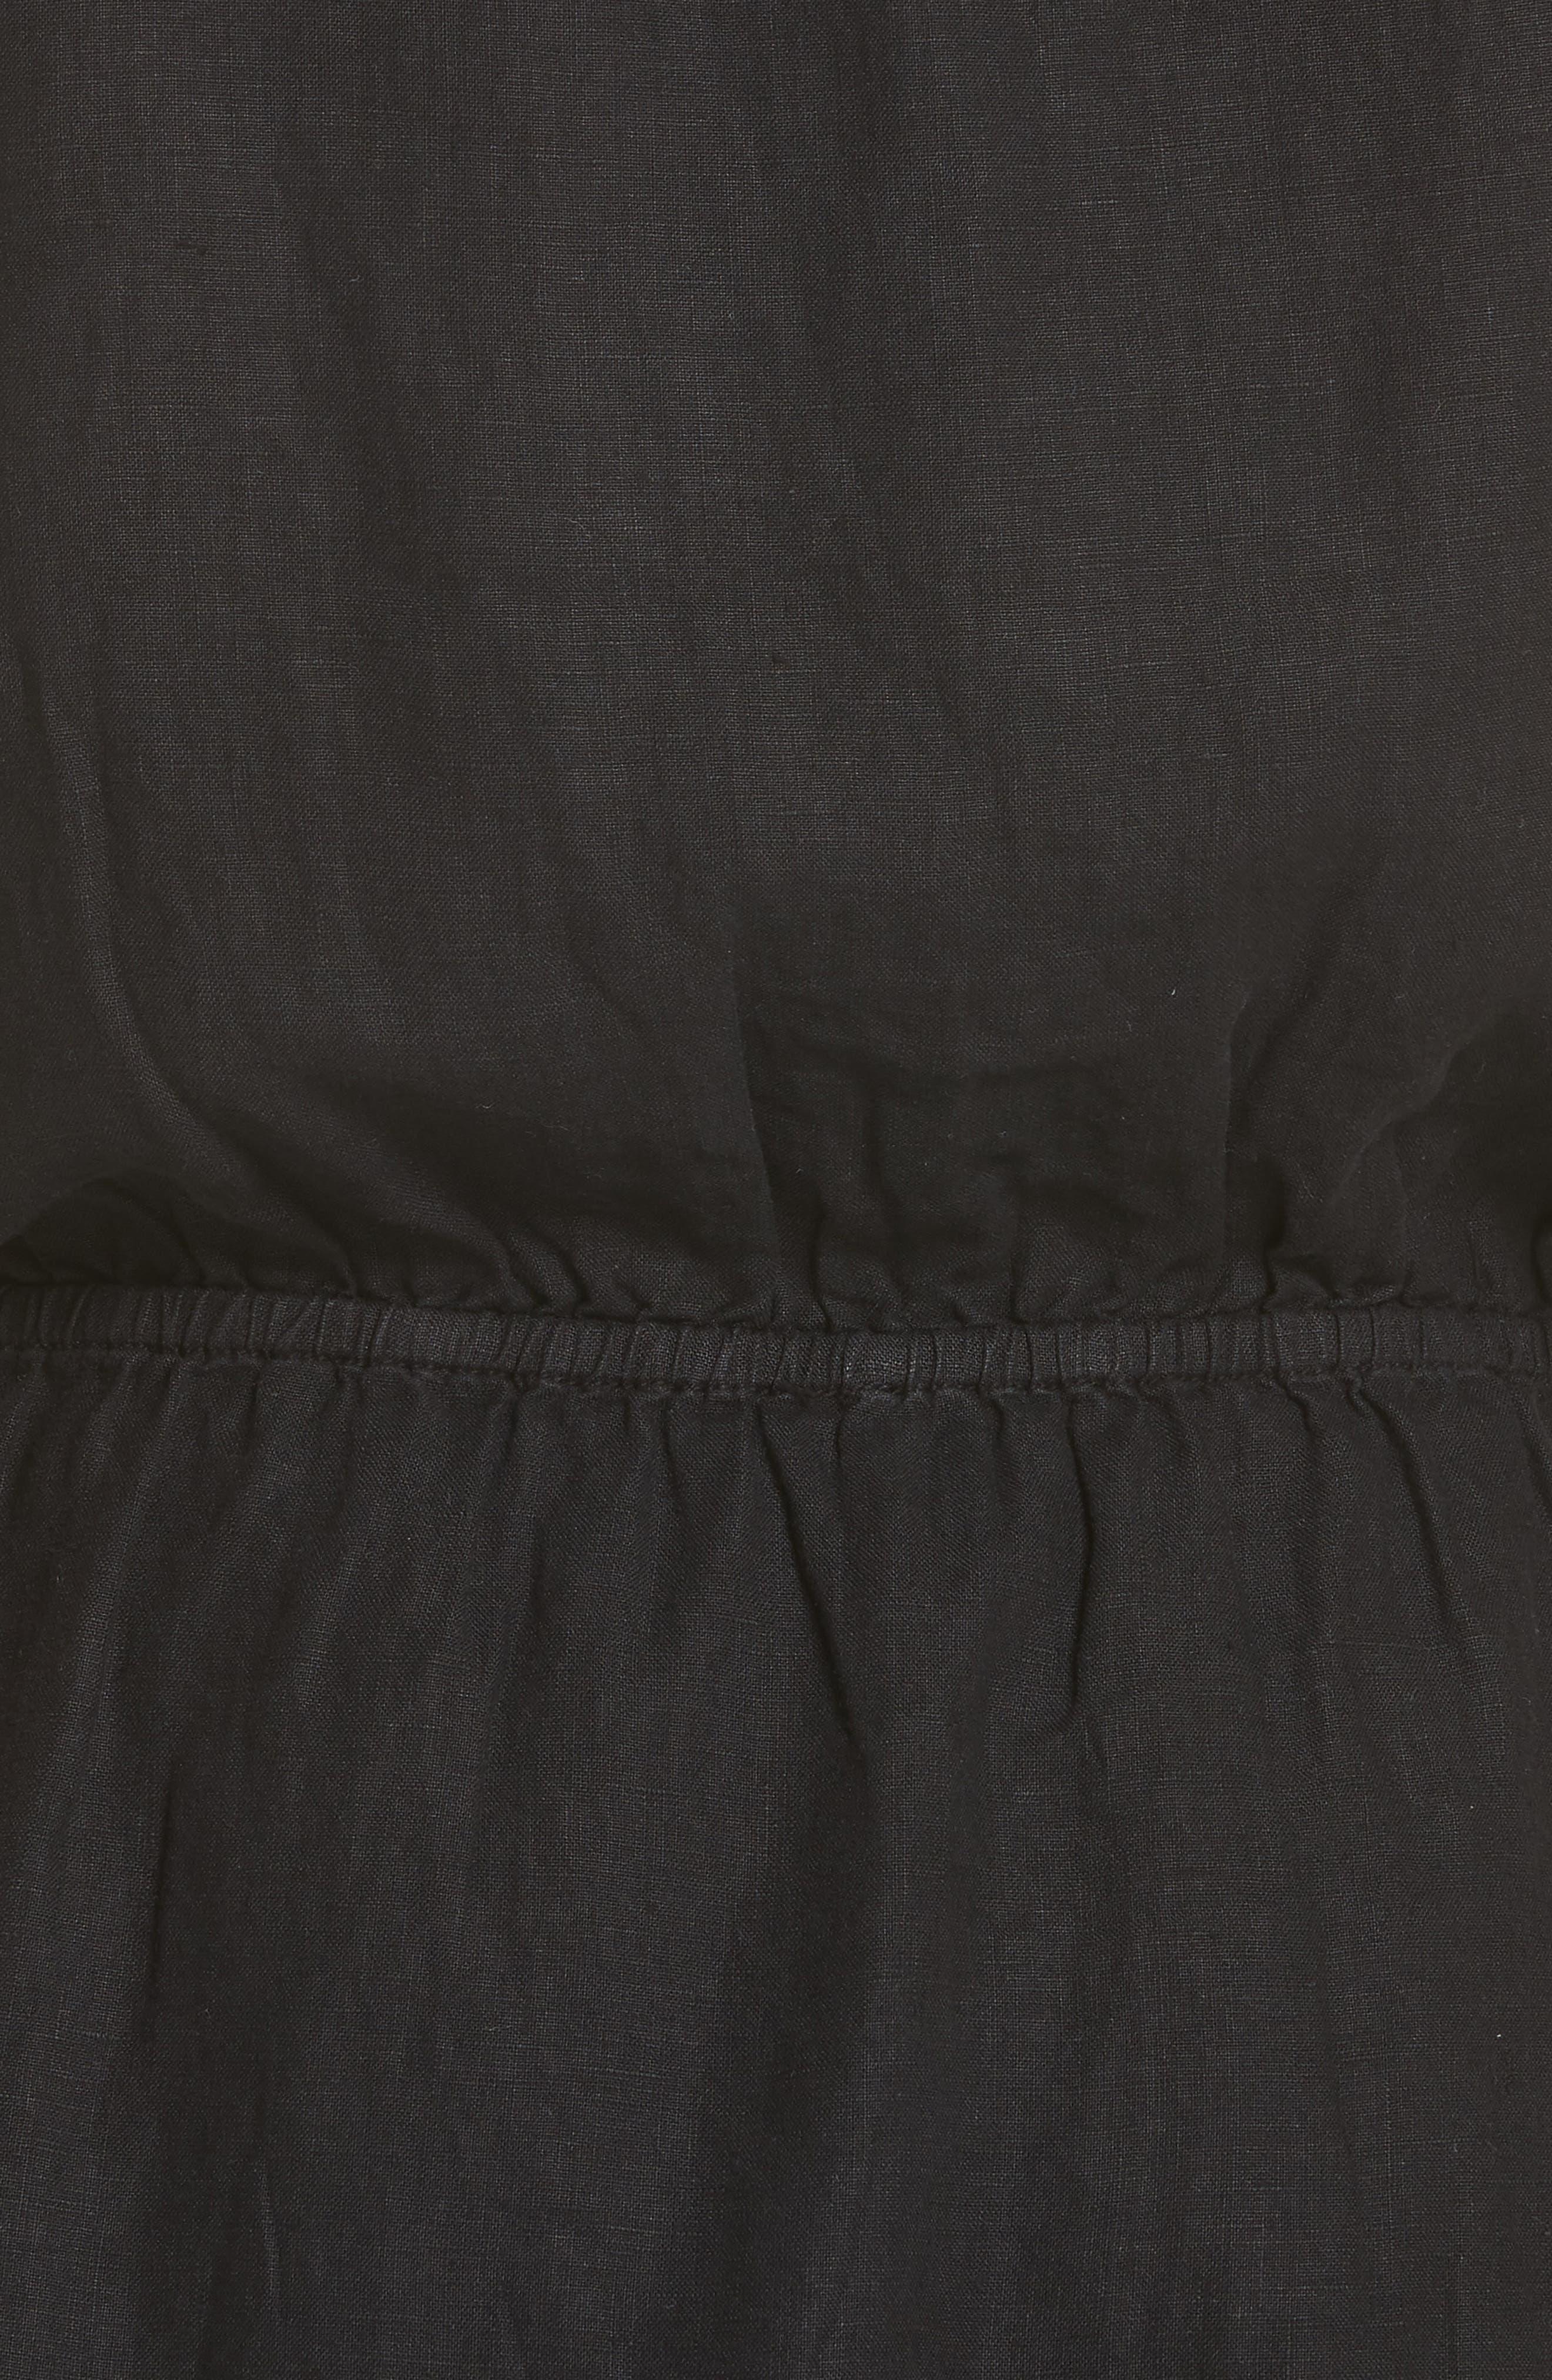 Quora Ruffle Linen Dress,                             Alternate thumbnail 9, color,